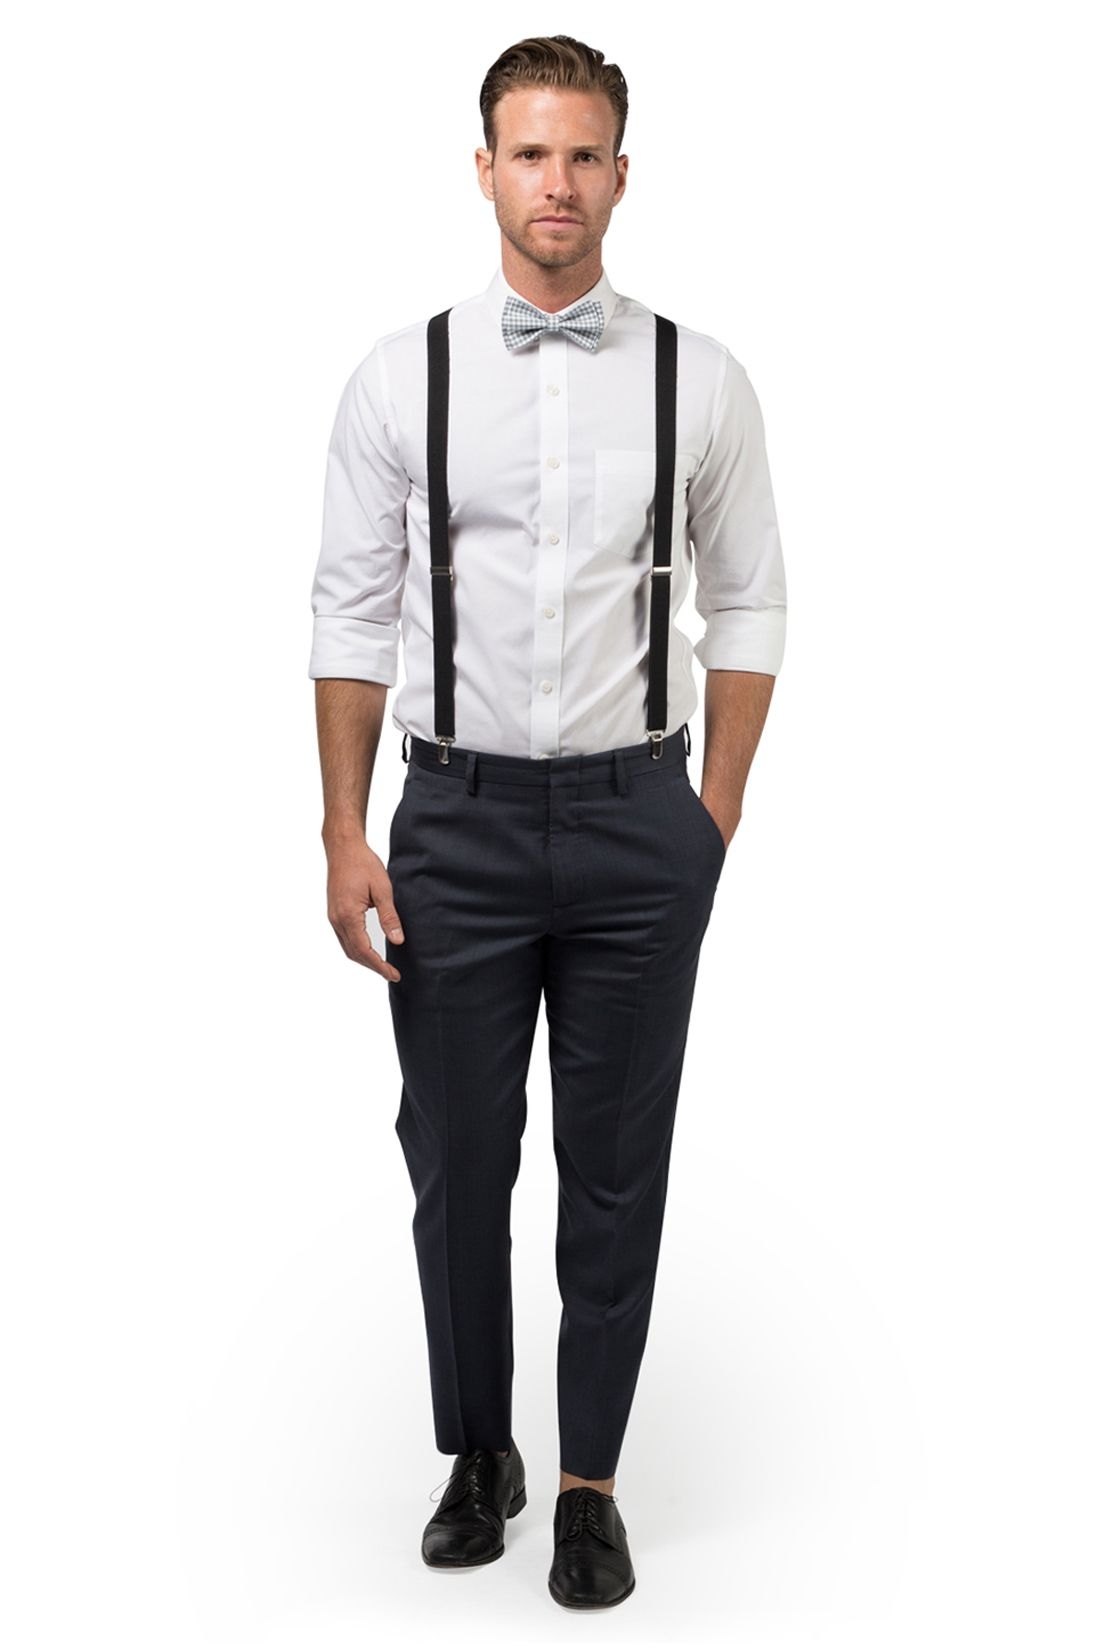 756053b6c9c6 Black Suspenders and Gingham Gray Bow Tie for Baby | Toddler | Boy | Men  #wedding #weddinginspiration #weddingideas #groom #groomsmen #ringbearer  #prom ...